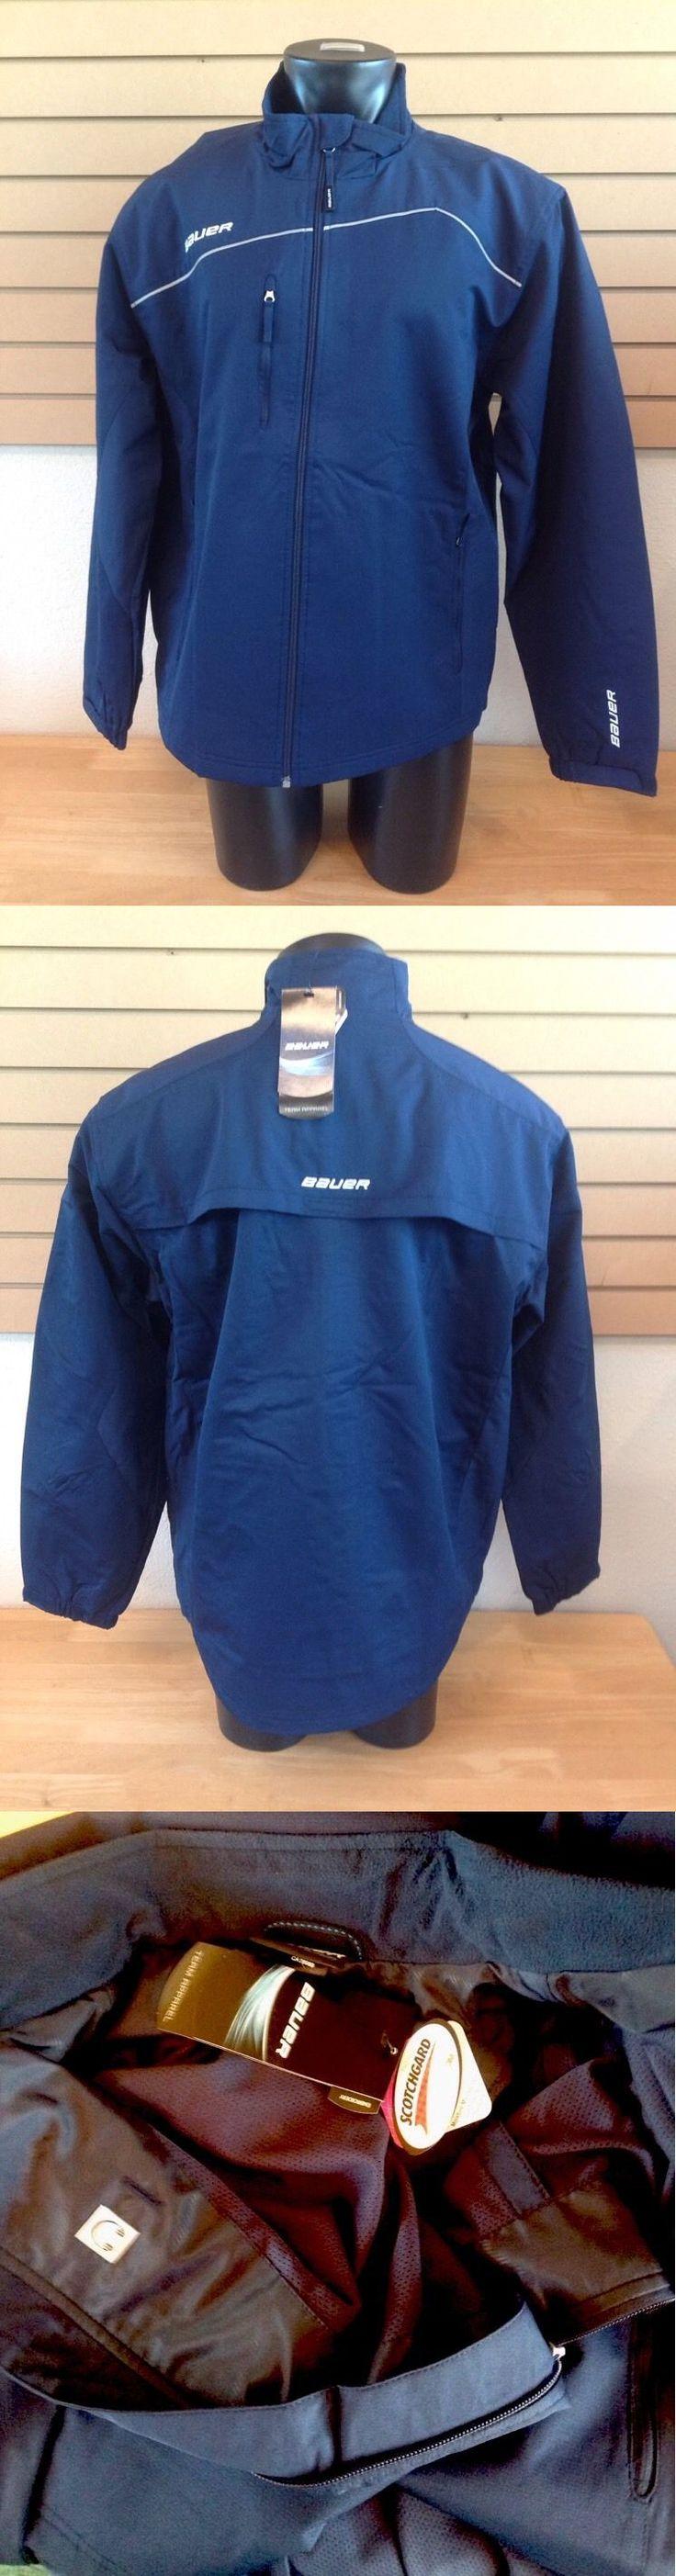 Men 159122: Bauer Hockey Navy Lightweight Warmup Jacket Size Senior Adult -> BUY IT NOW ONLY: $45 on eBay!